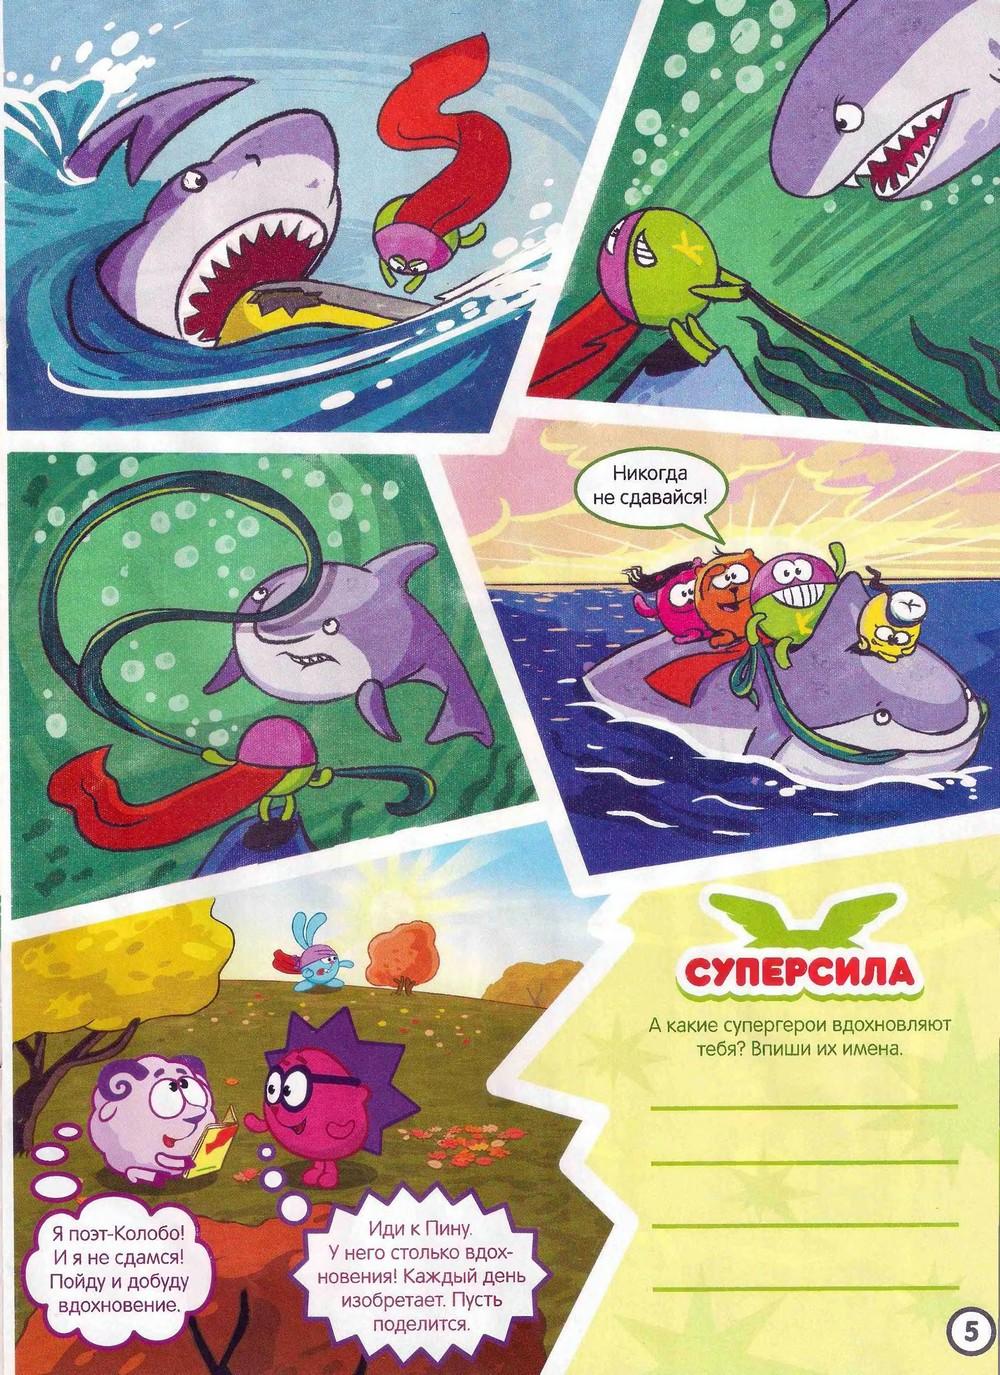 http://i6.imageban.ru/out/2013/12/29/5c793d3f31c46c7783ad6c4c97c3044c.jpg